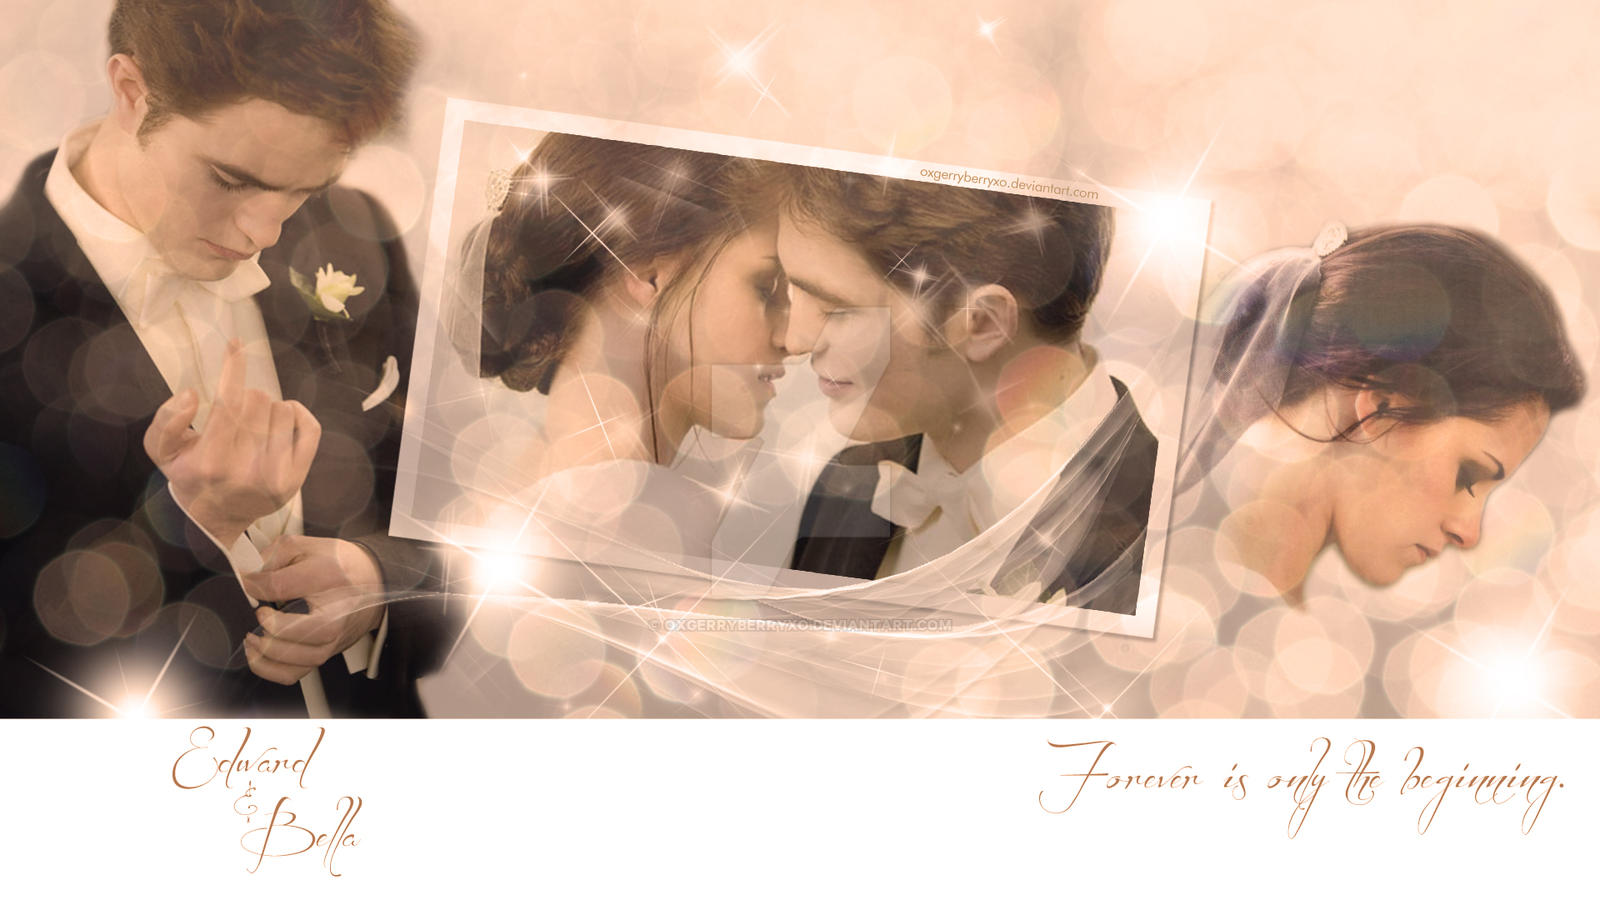 edward and bella wedding kiss v2 by oxgerryberryxo on